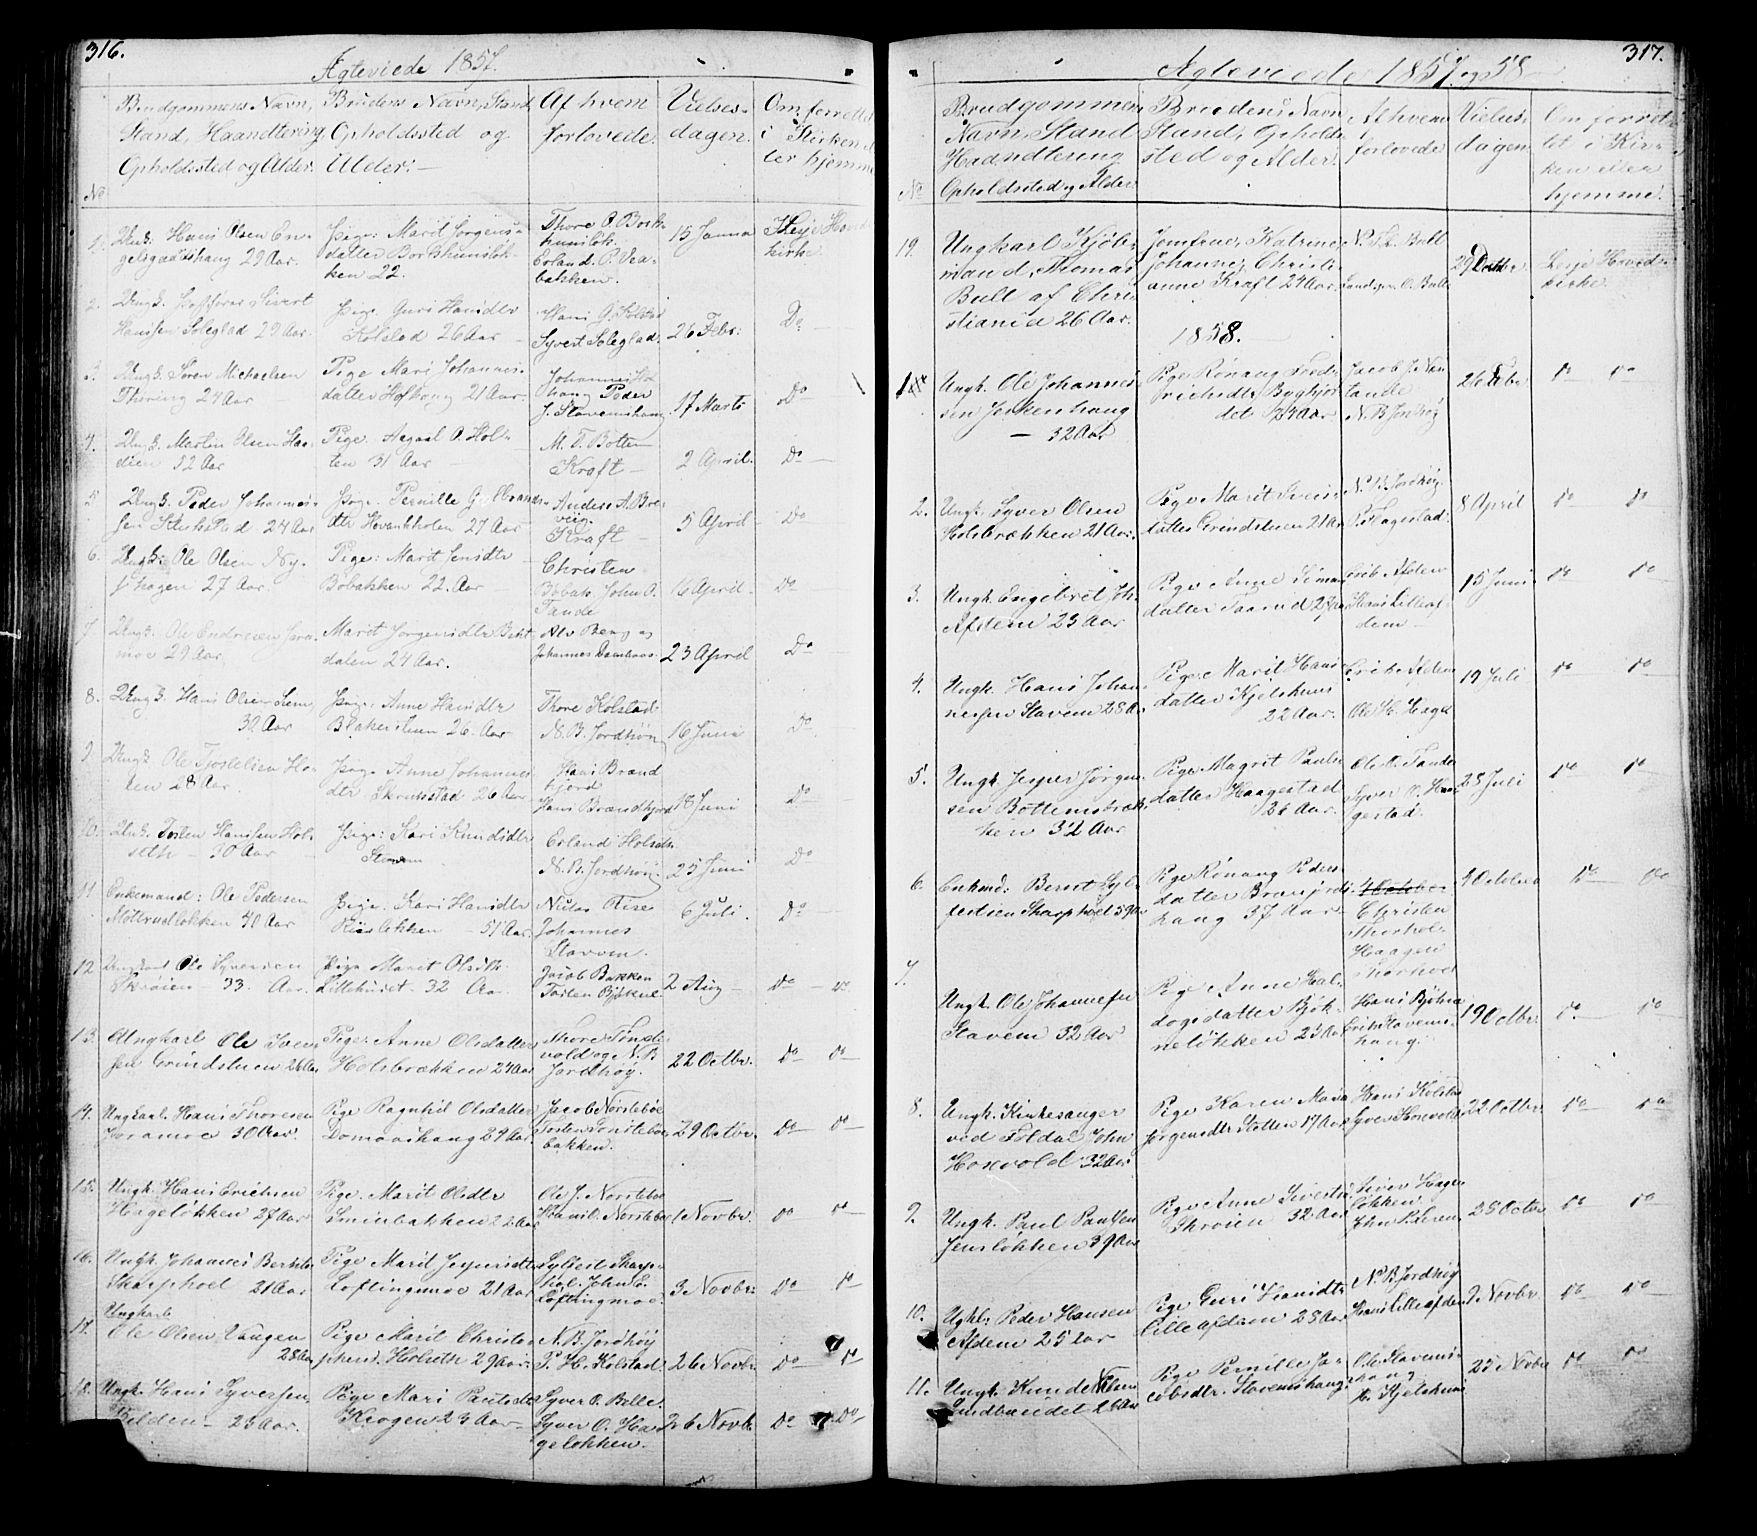 SAH, Lesja prestekontor, Klokkerbok nr. 5, 1850-1894, s. 316-317